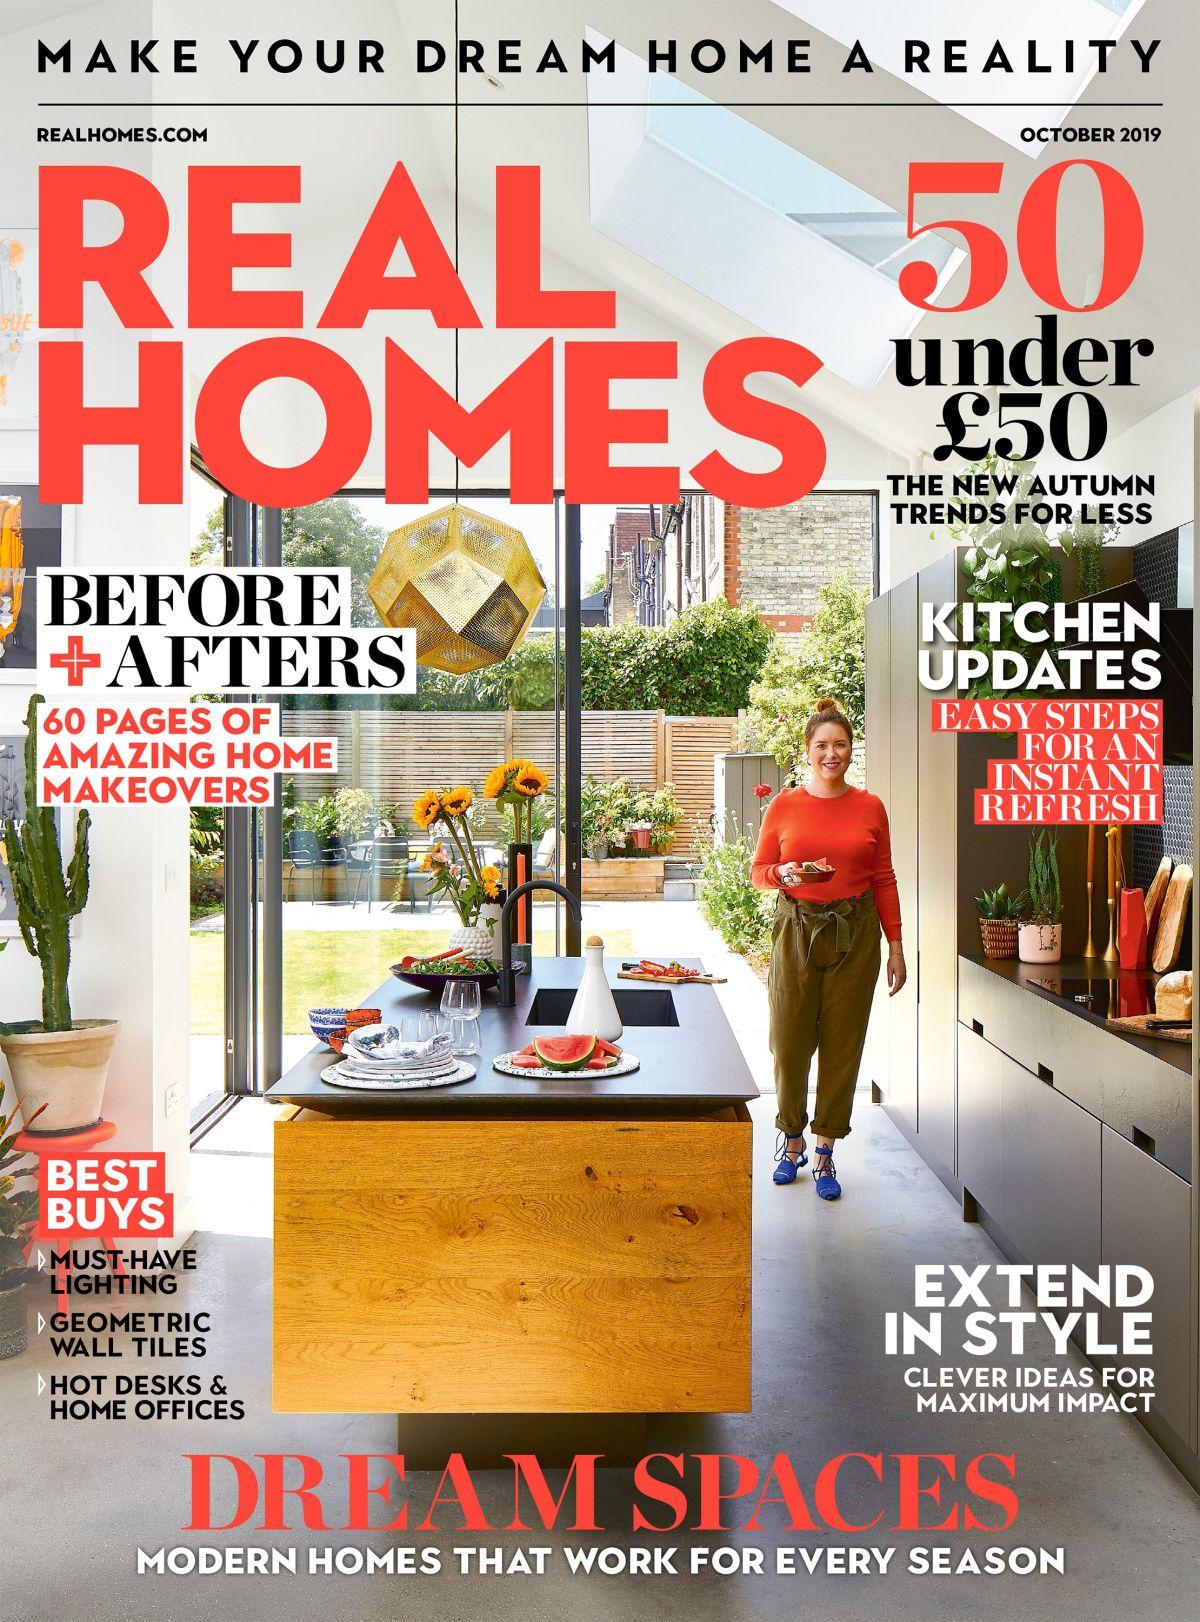 10 exterior home makeover ideas   Real Homes